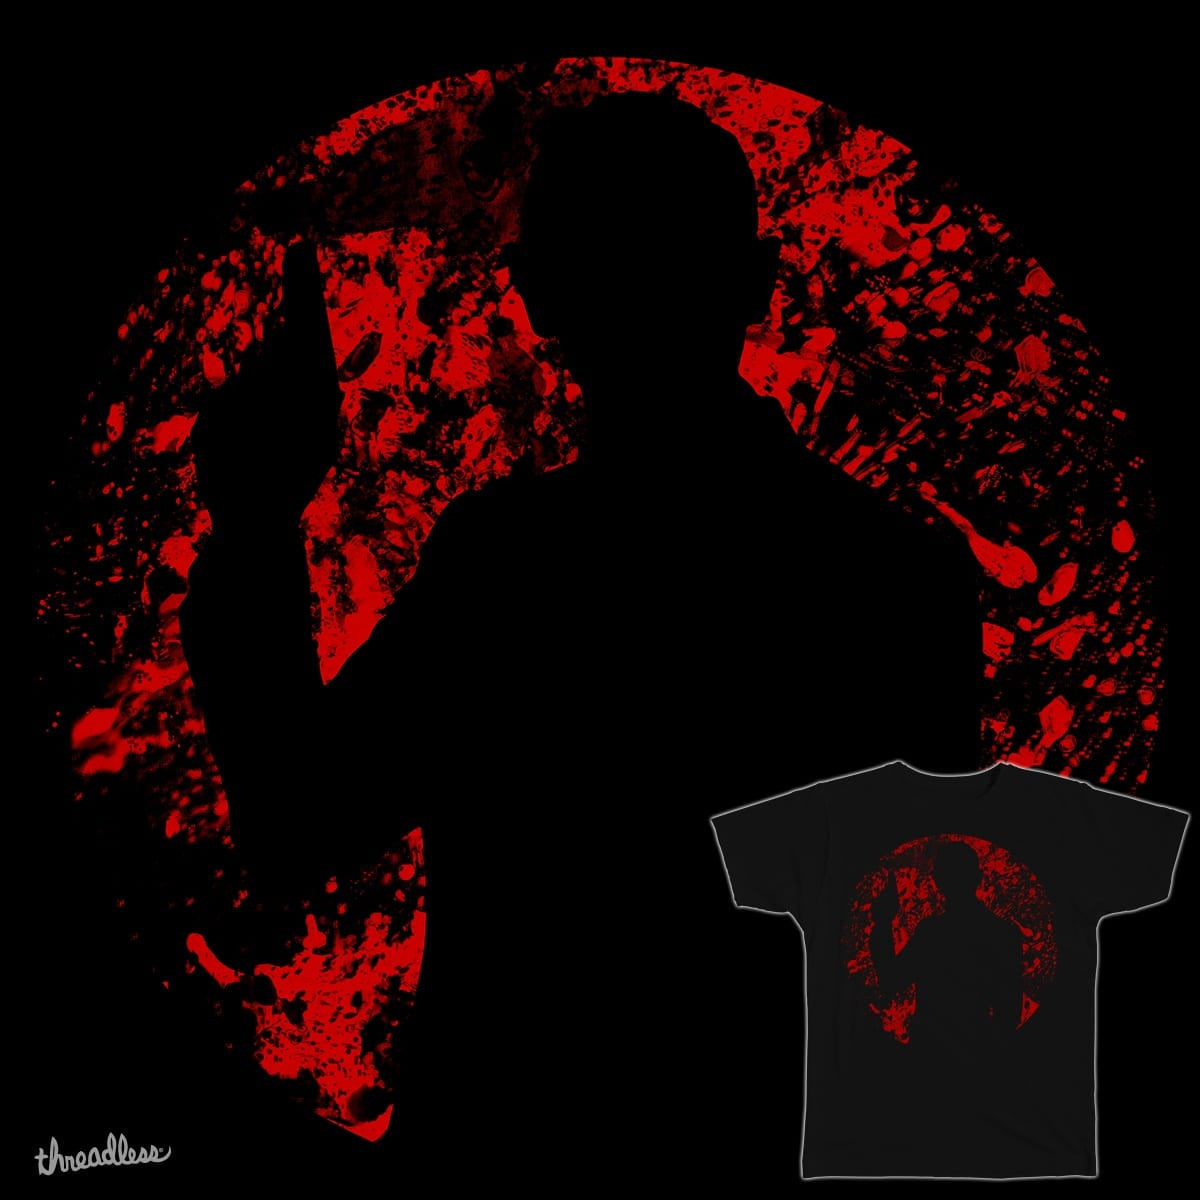 Bond by Blood by ProxishDesigns on Threadless